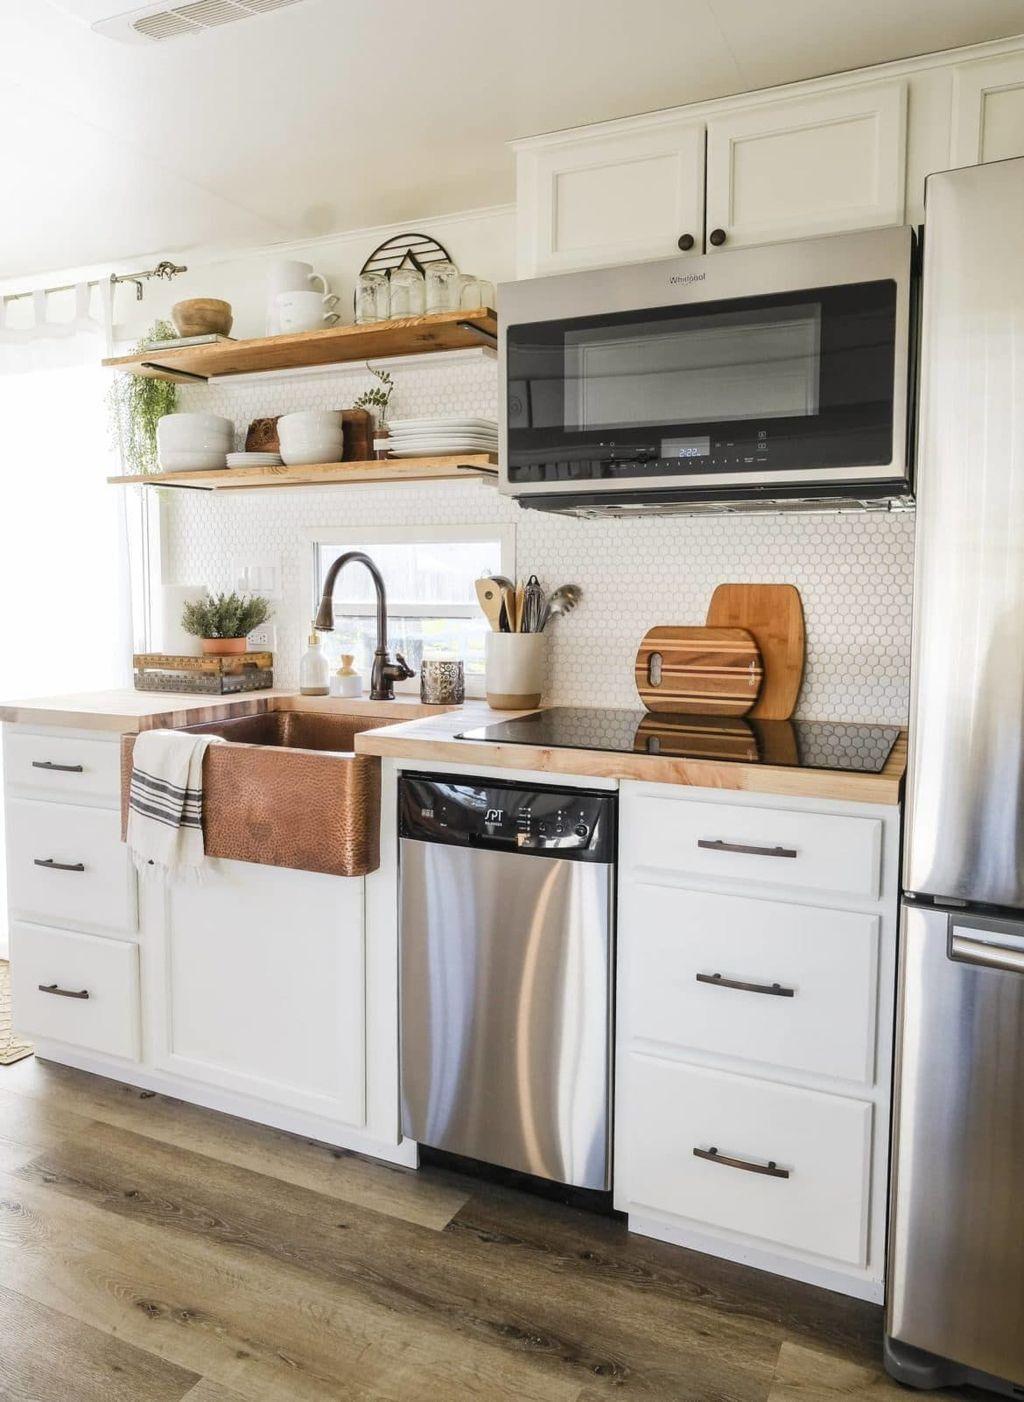 Inspiring RV Kitchen Design And Decor Ideas 25